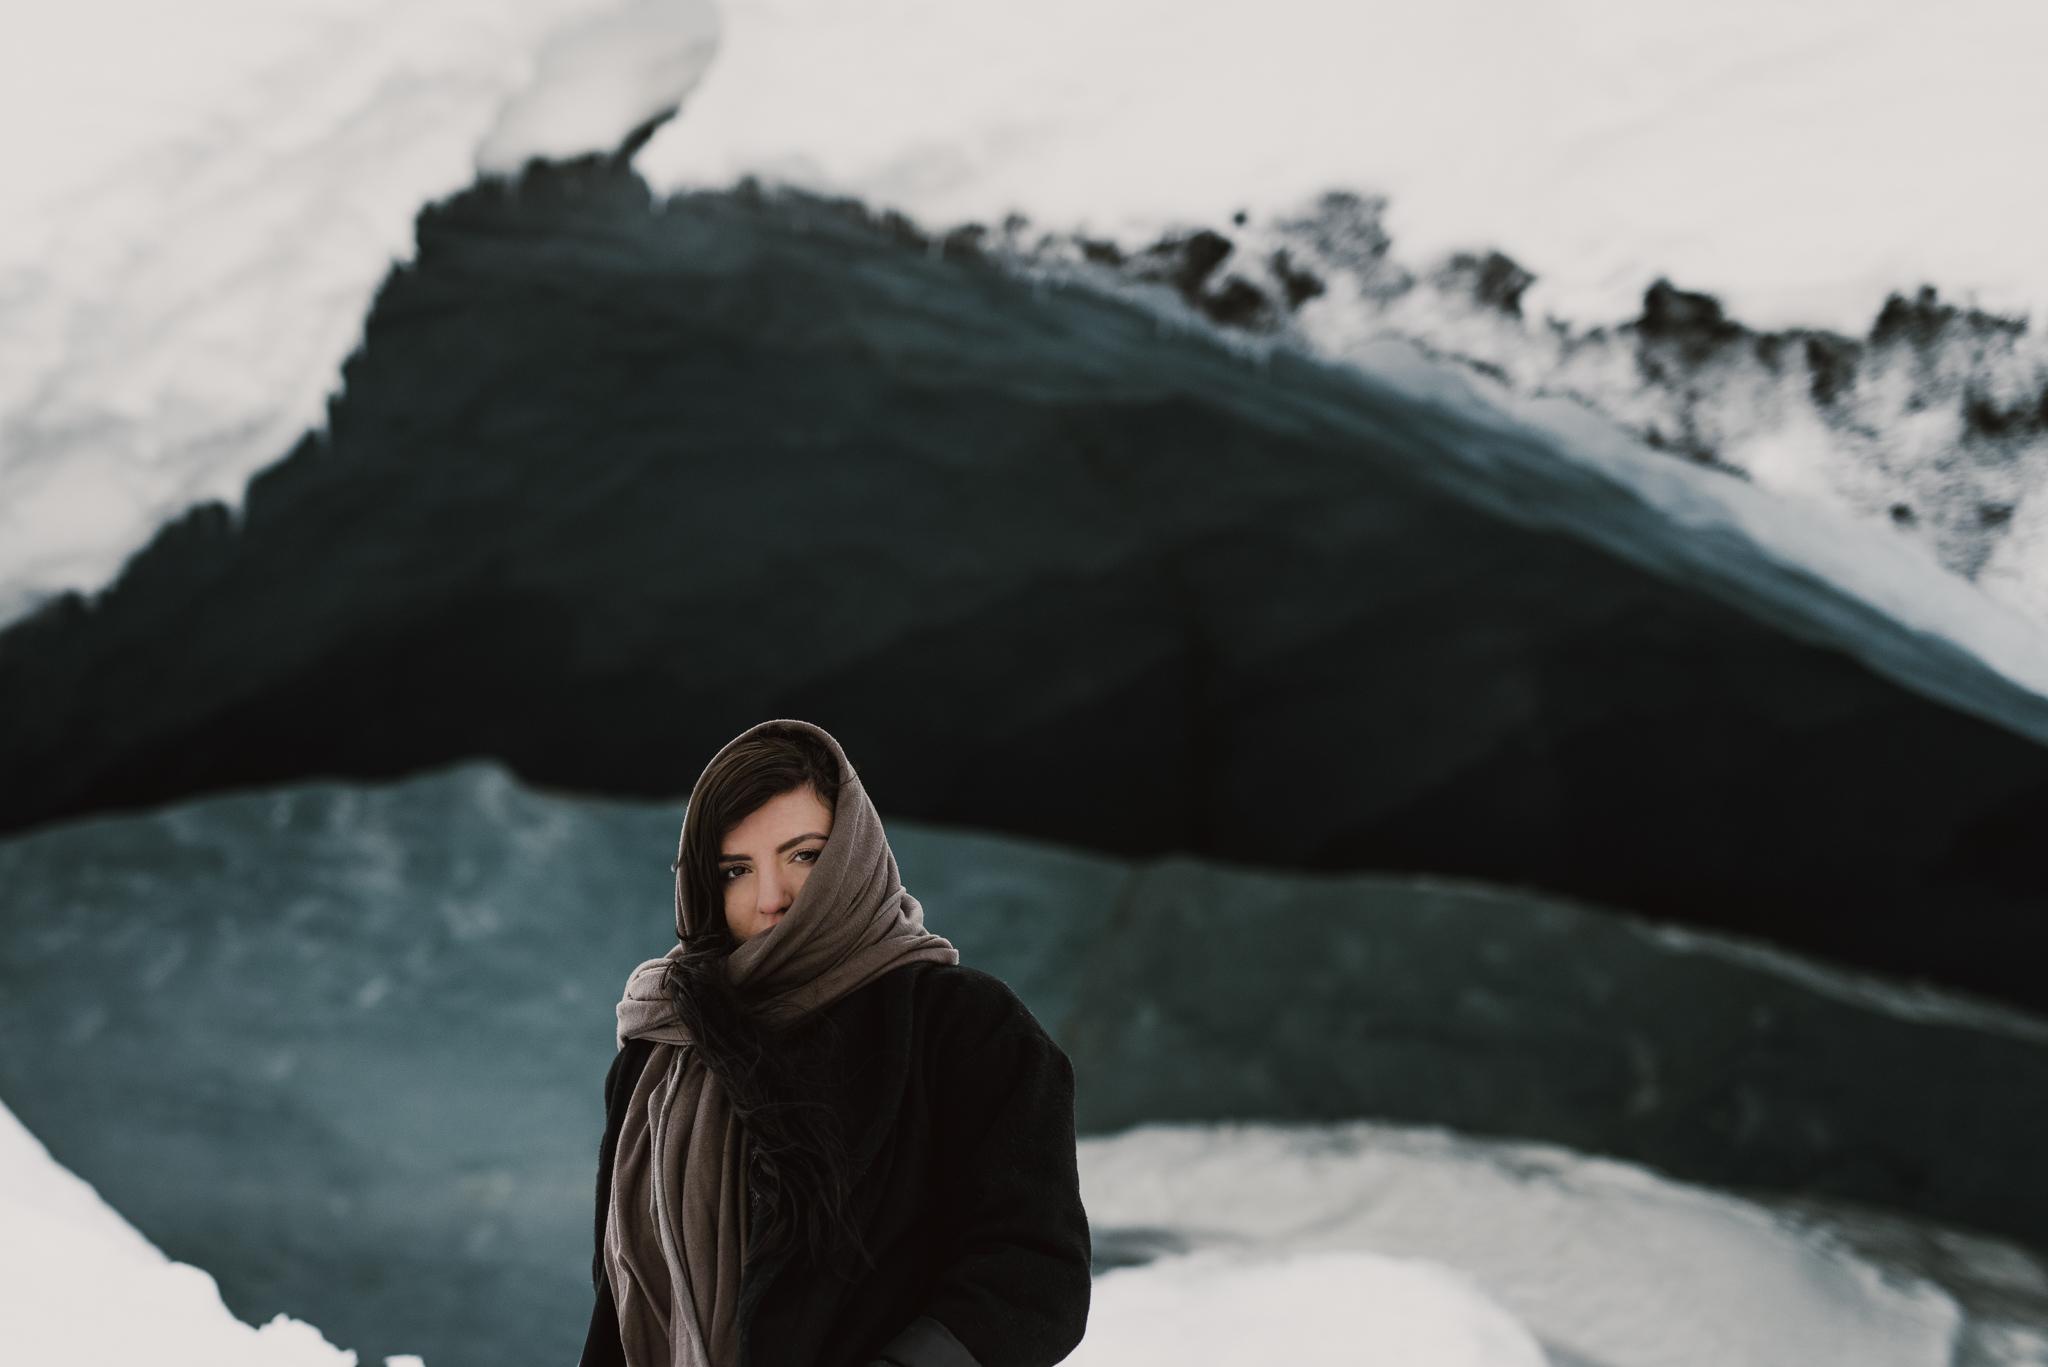 ©The-Ryans-Photo---Athabasca-Glacier,-Ice-Cave-029.jpg